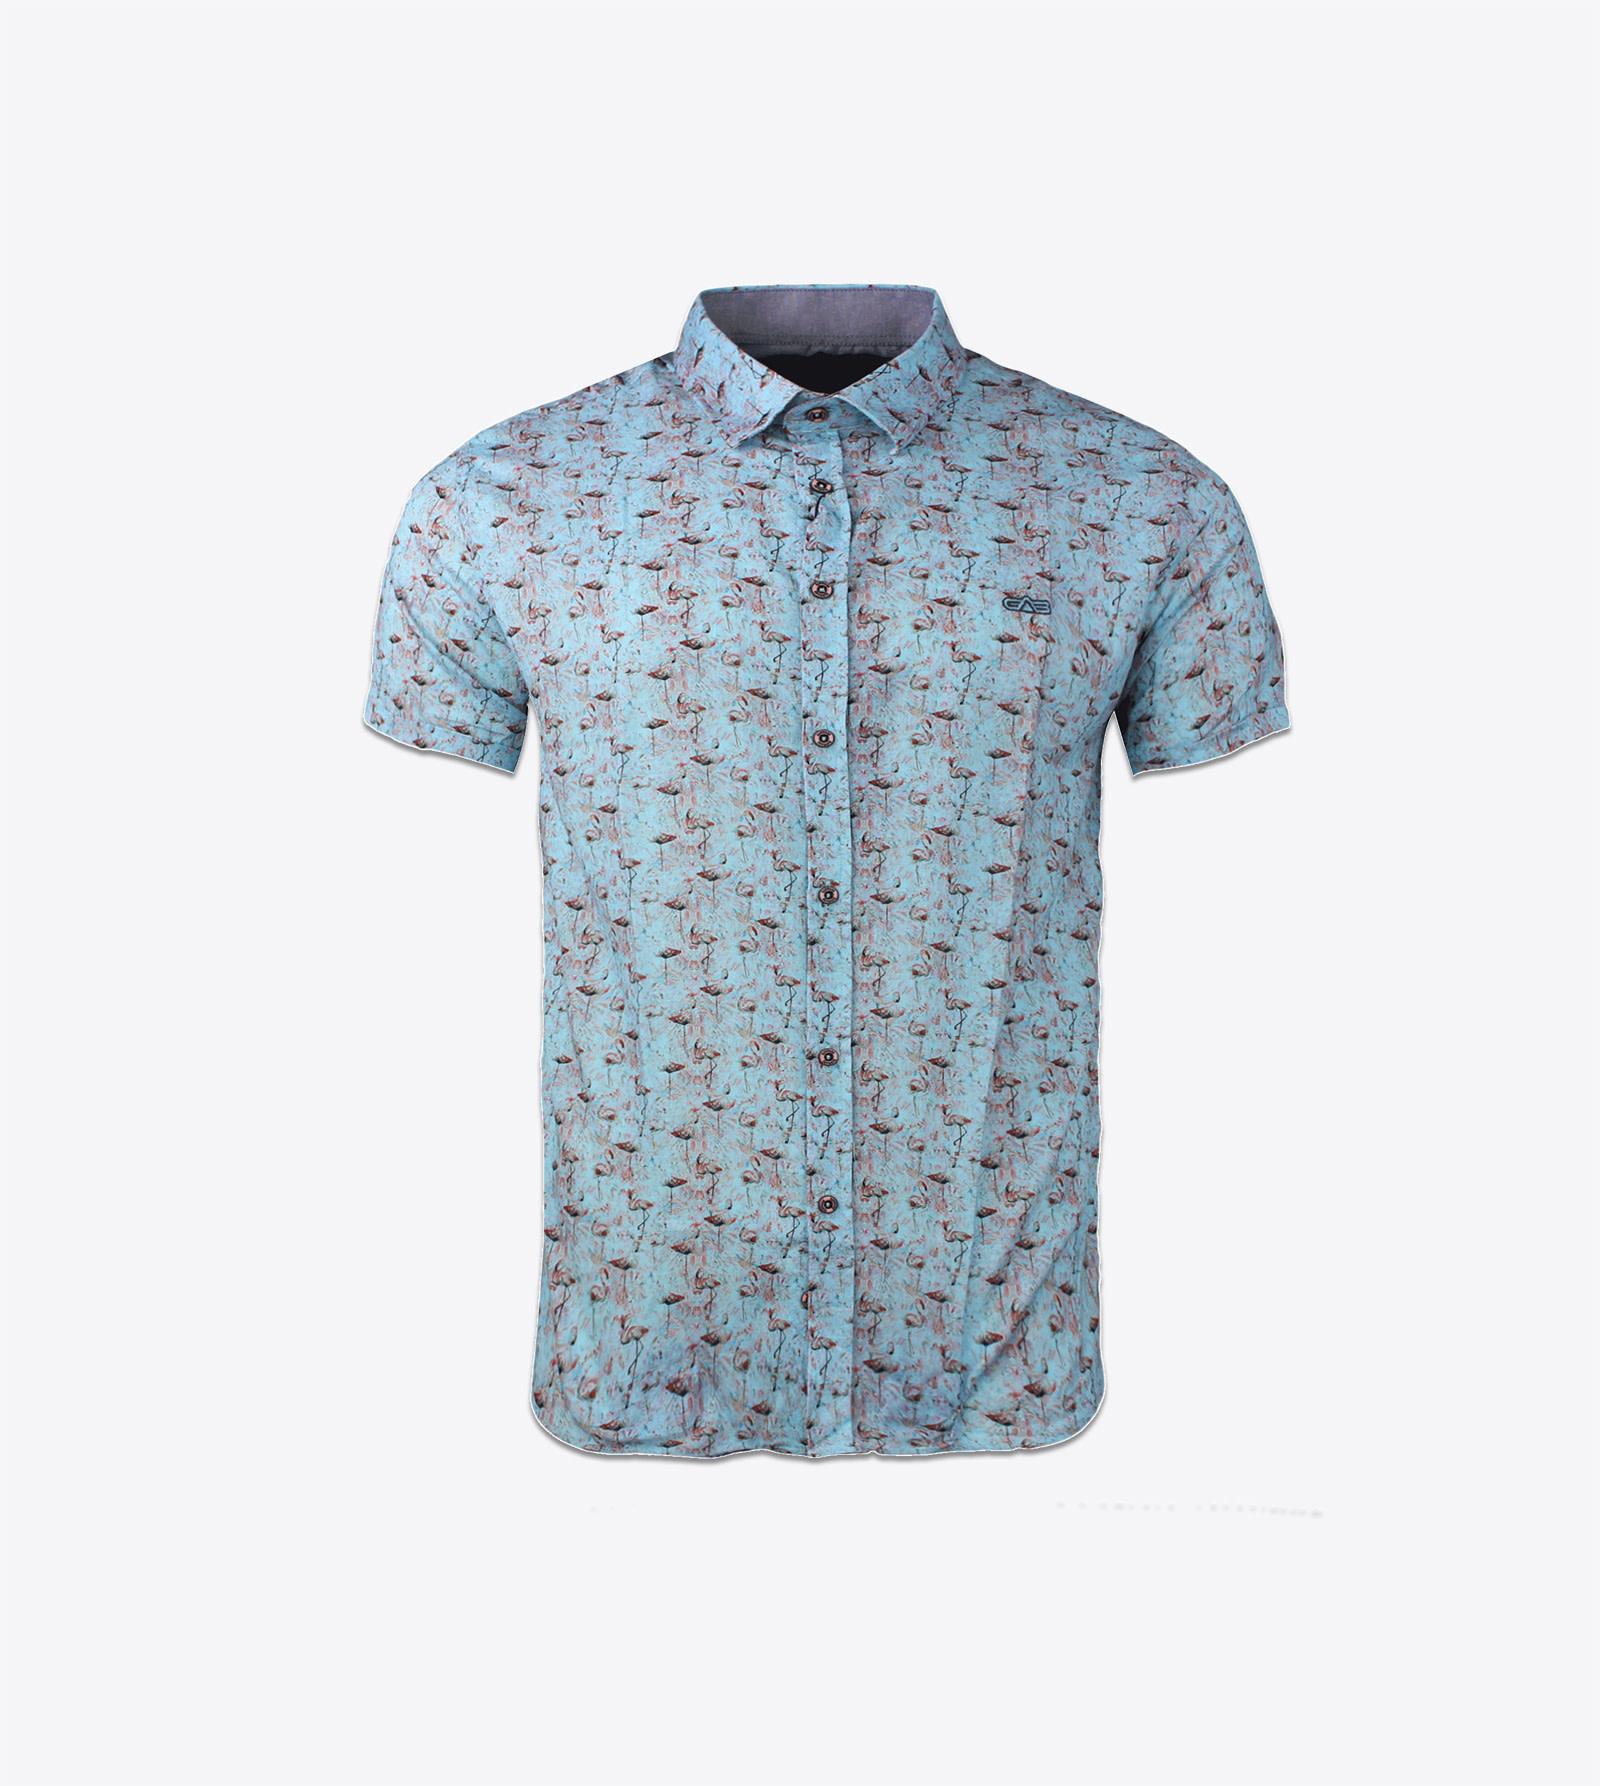 Gabbiano Gabbiano 33871 Shirt Blue